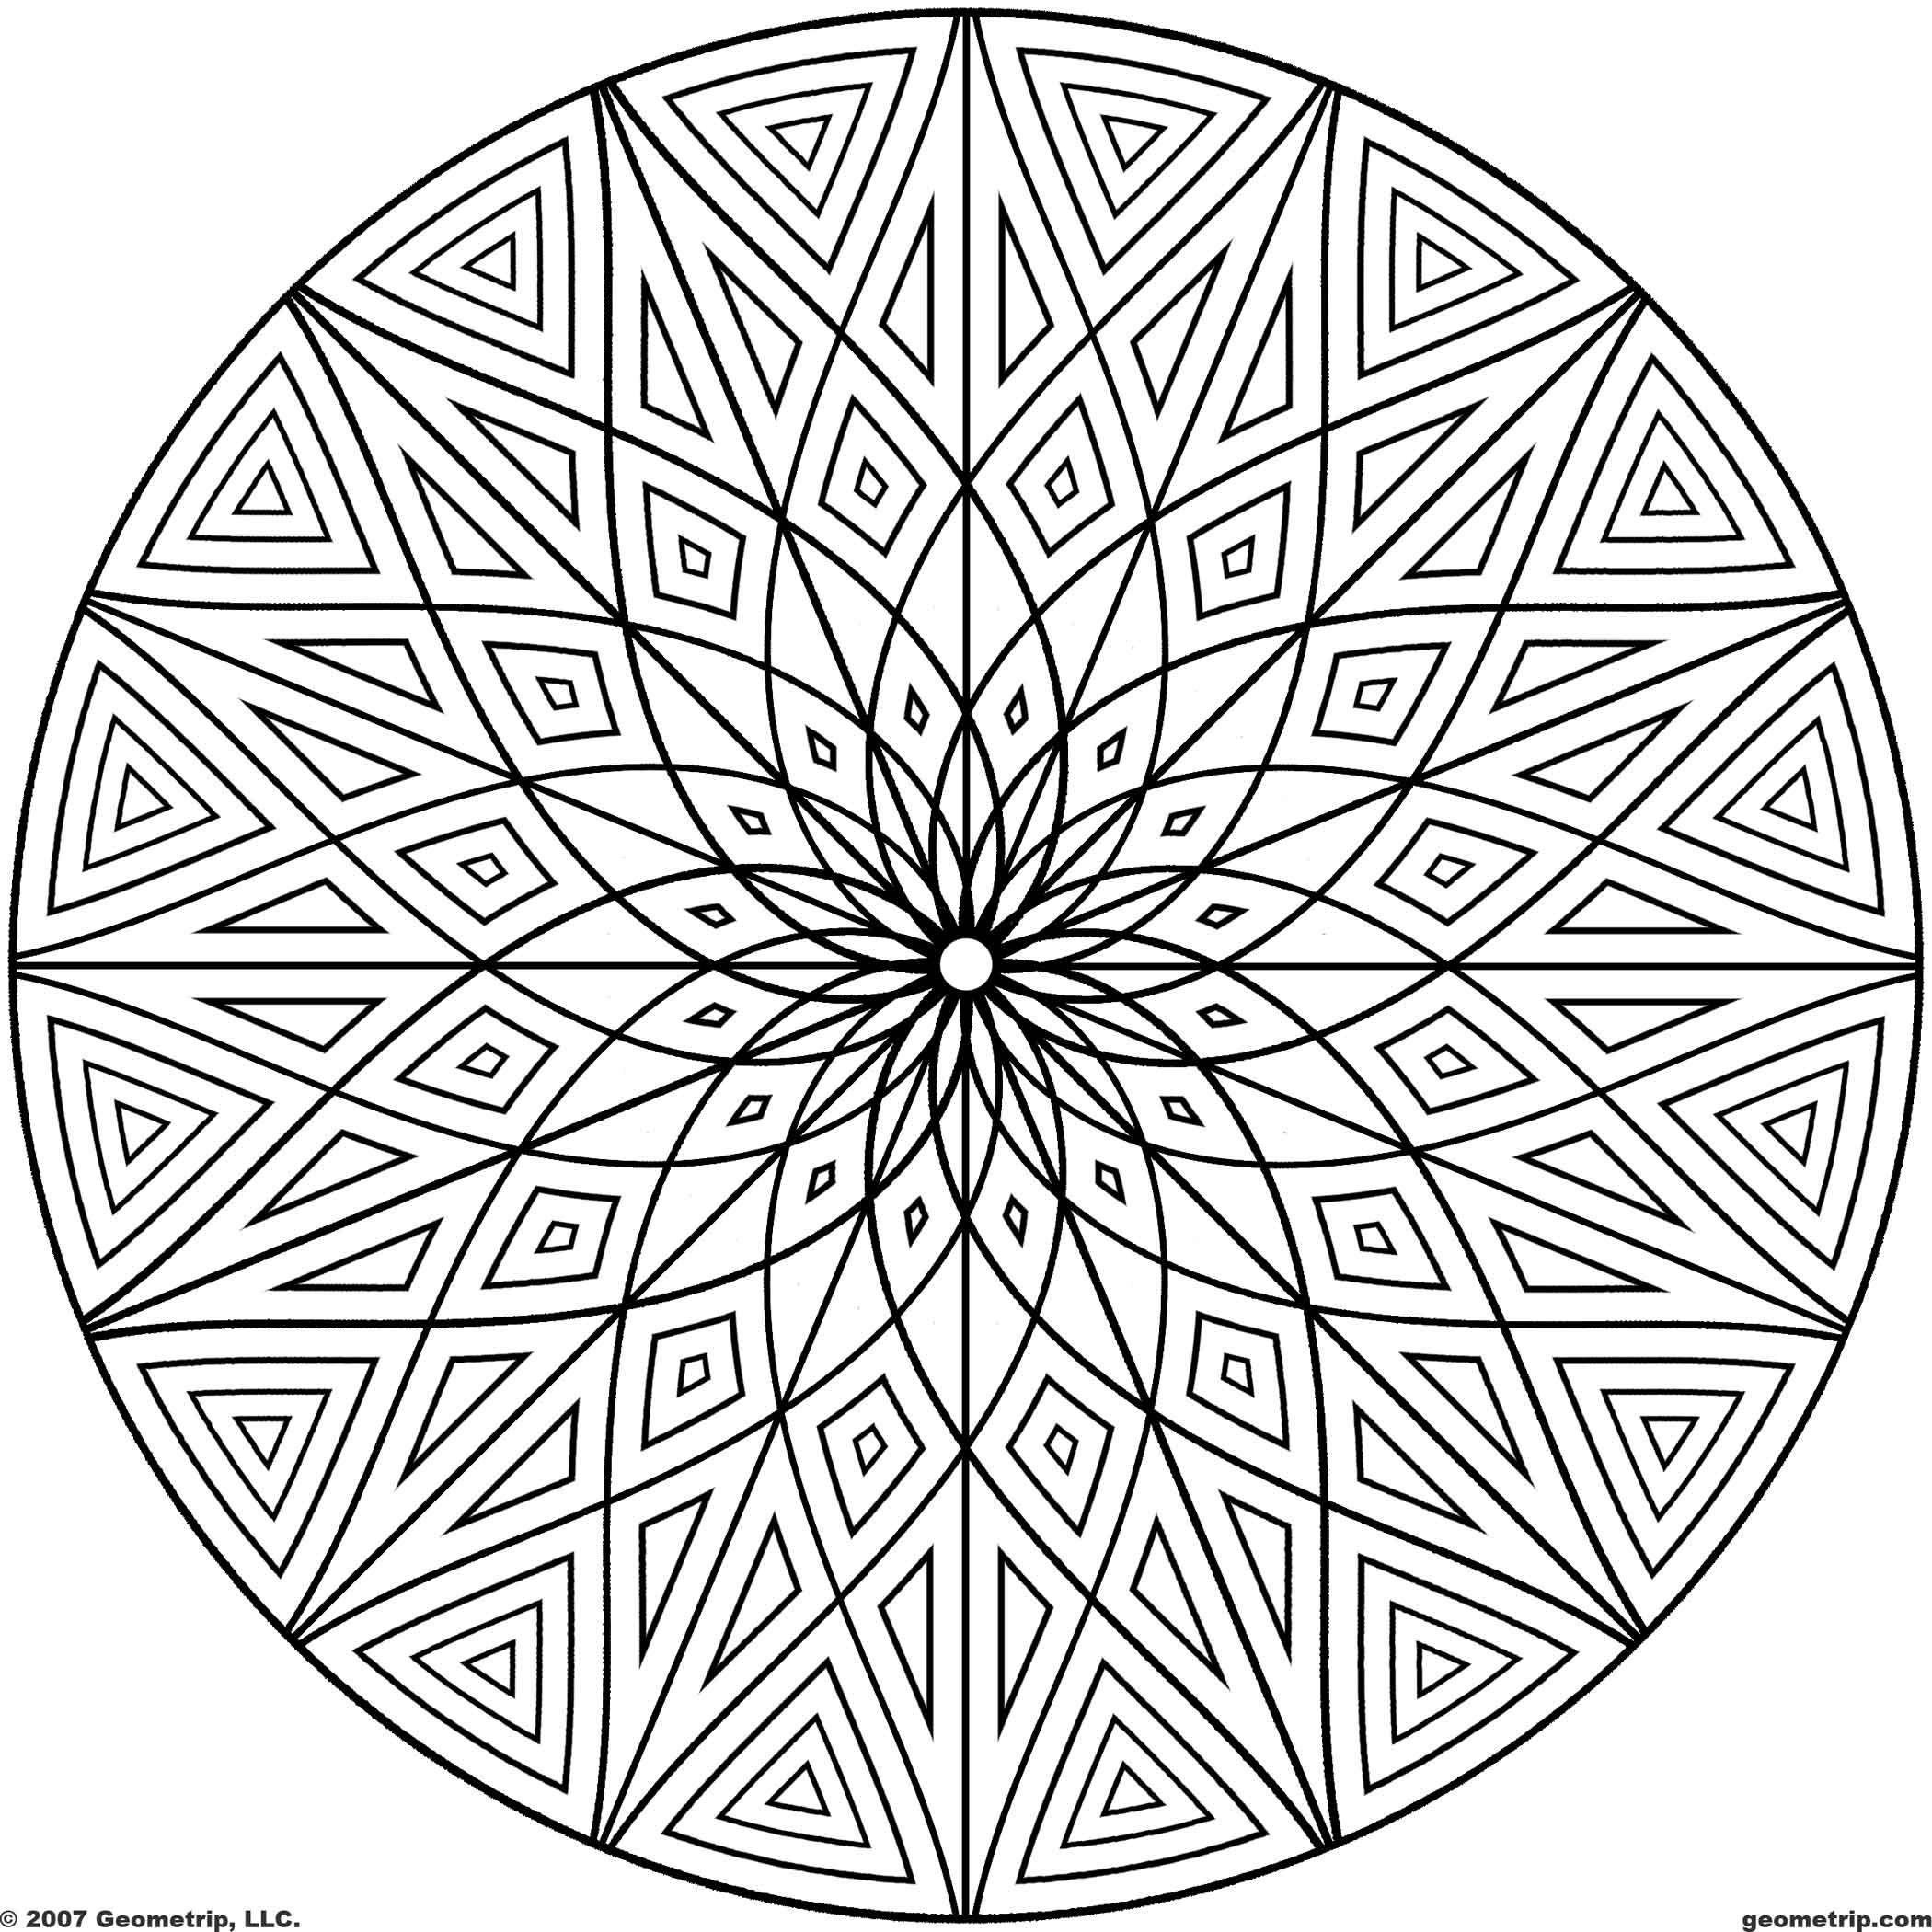 2100x2100 Printable Geometric Patterns